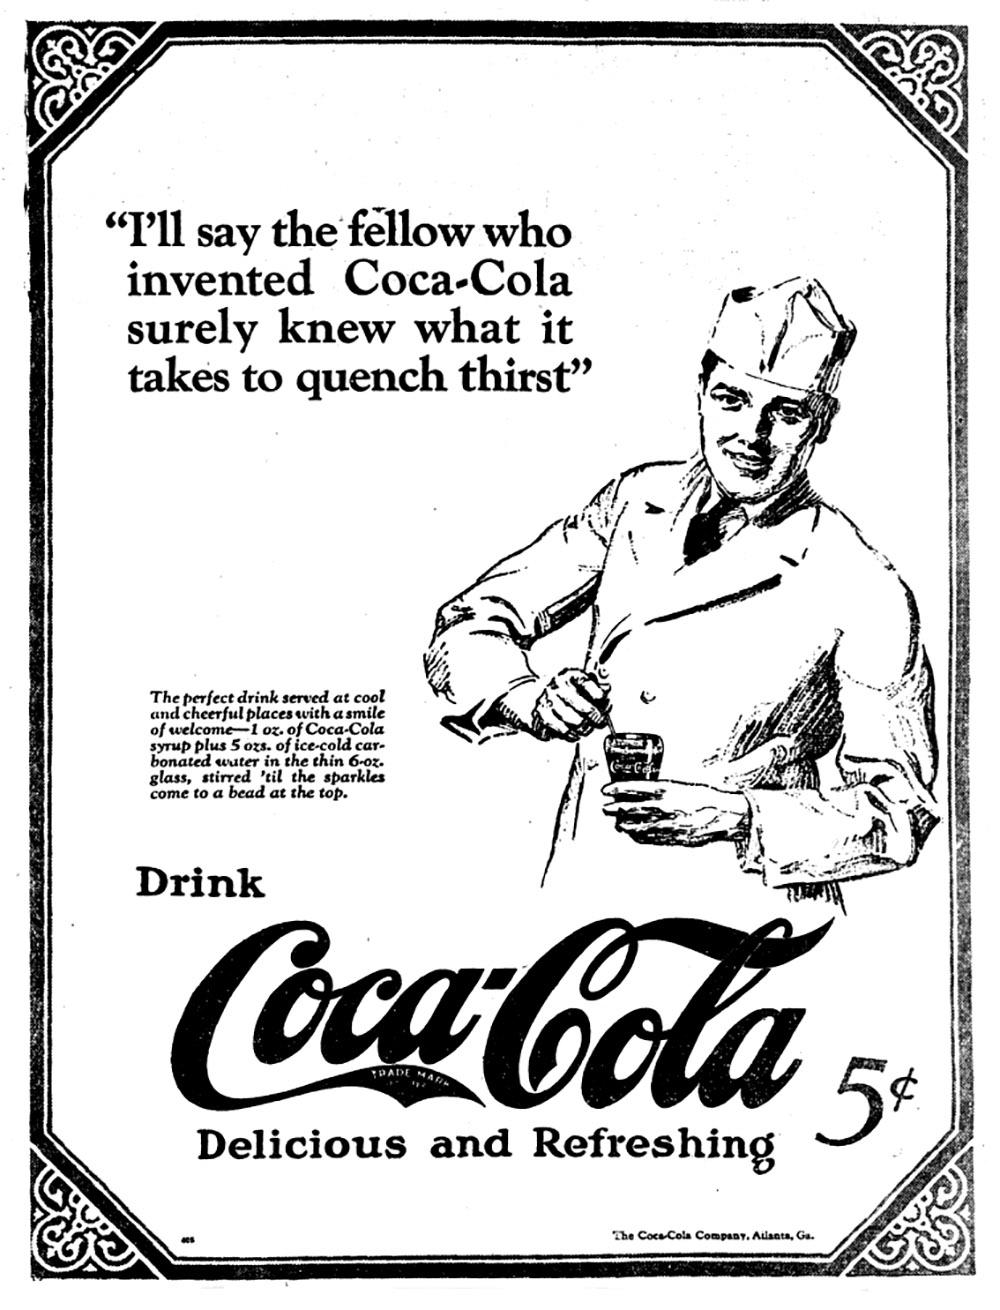 1924 Coca-Cola advertisement